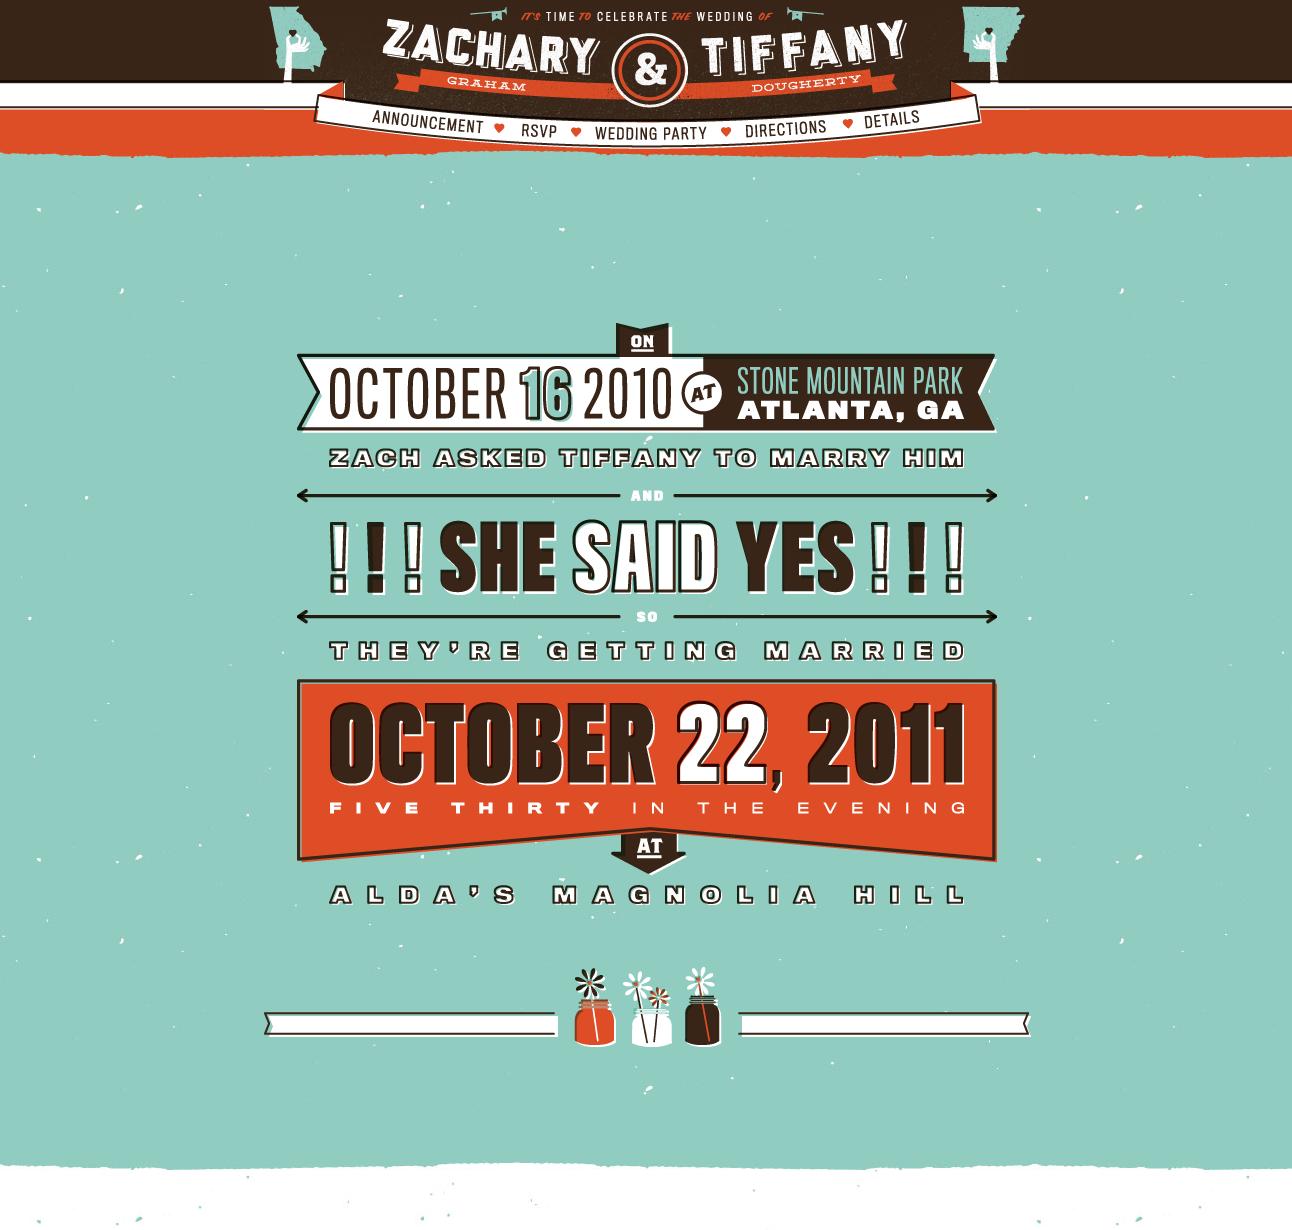 Zachary & Tiffany Wedding Website